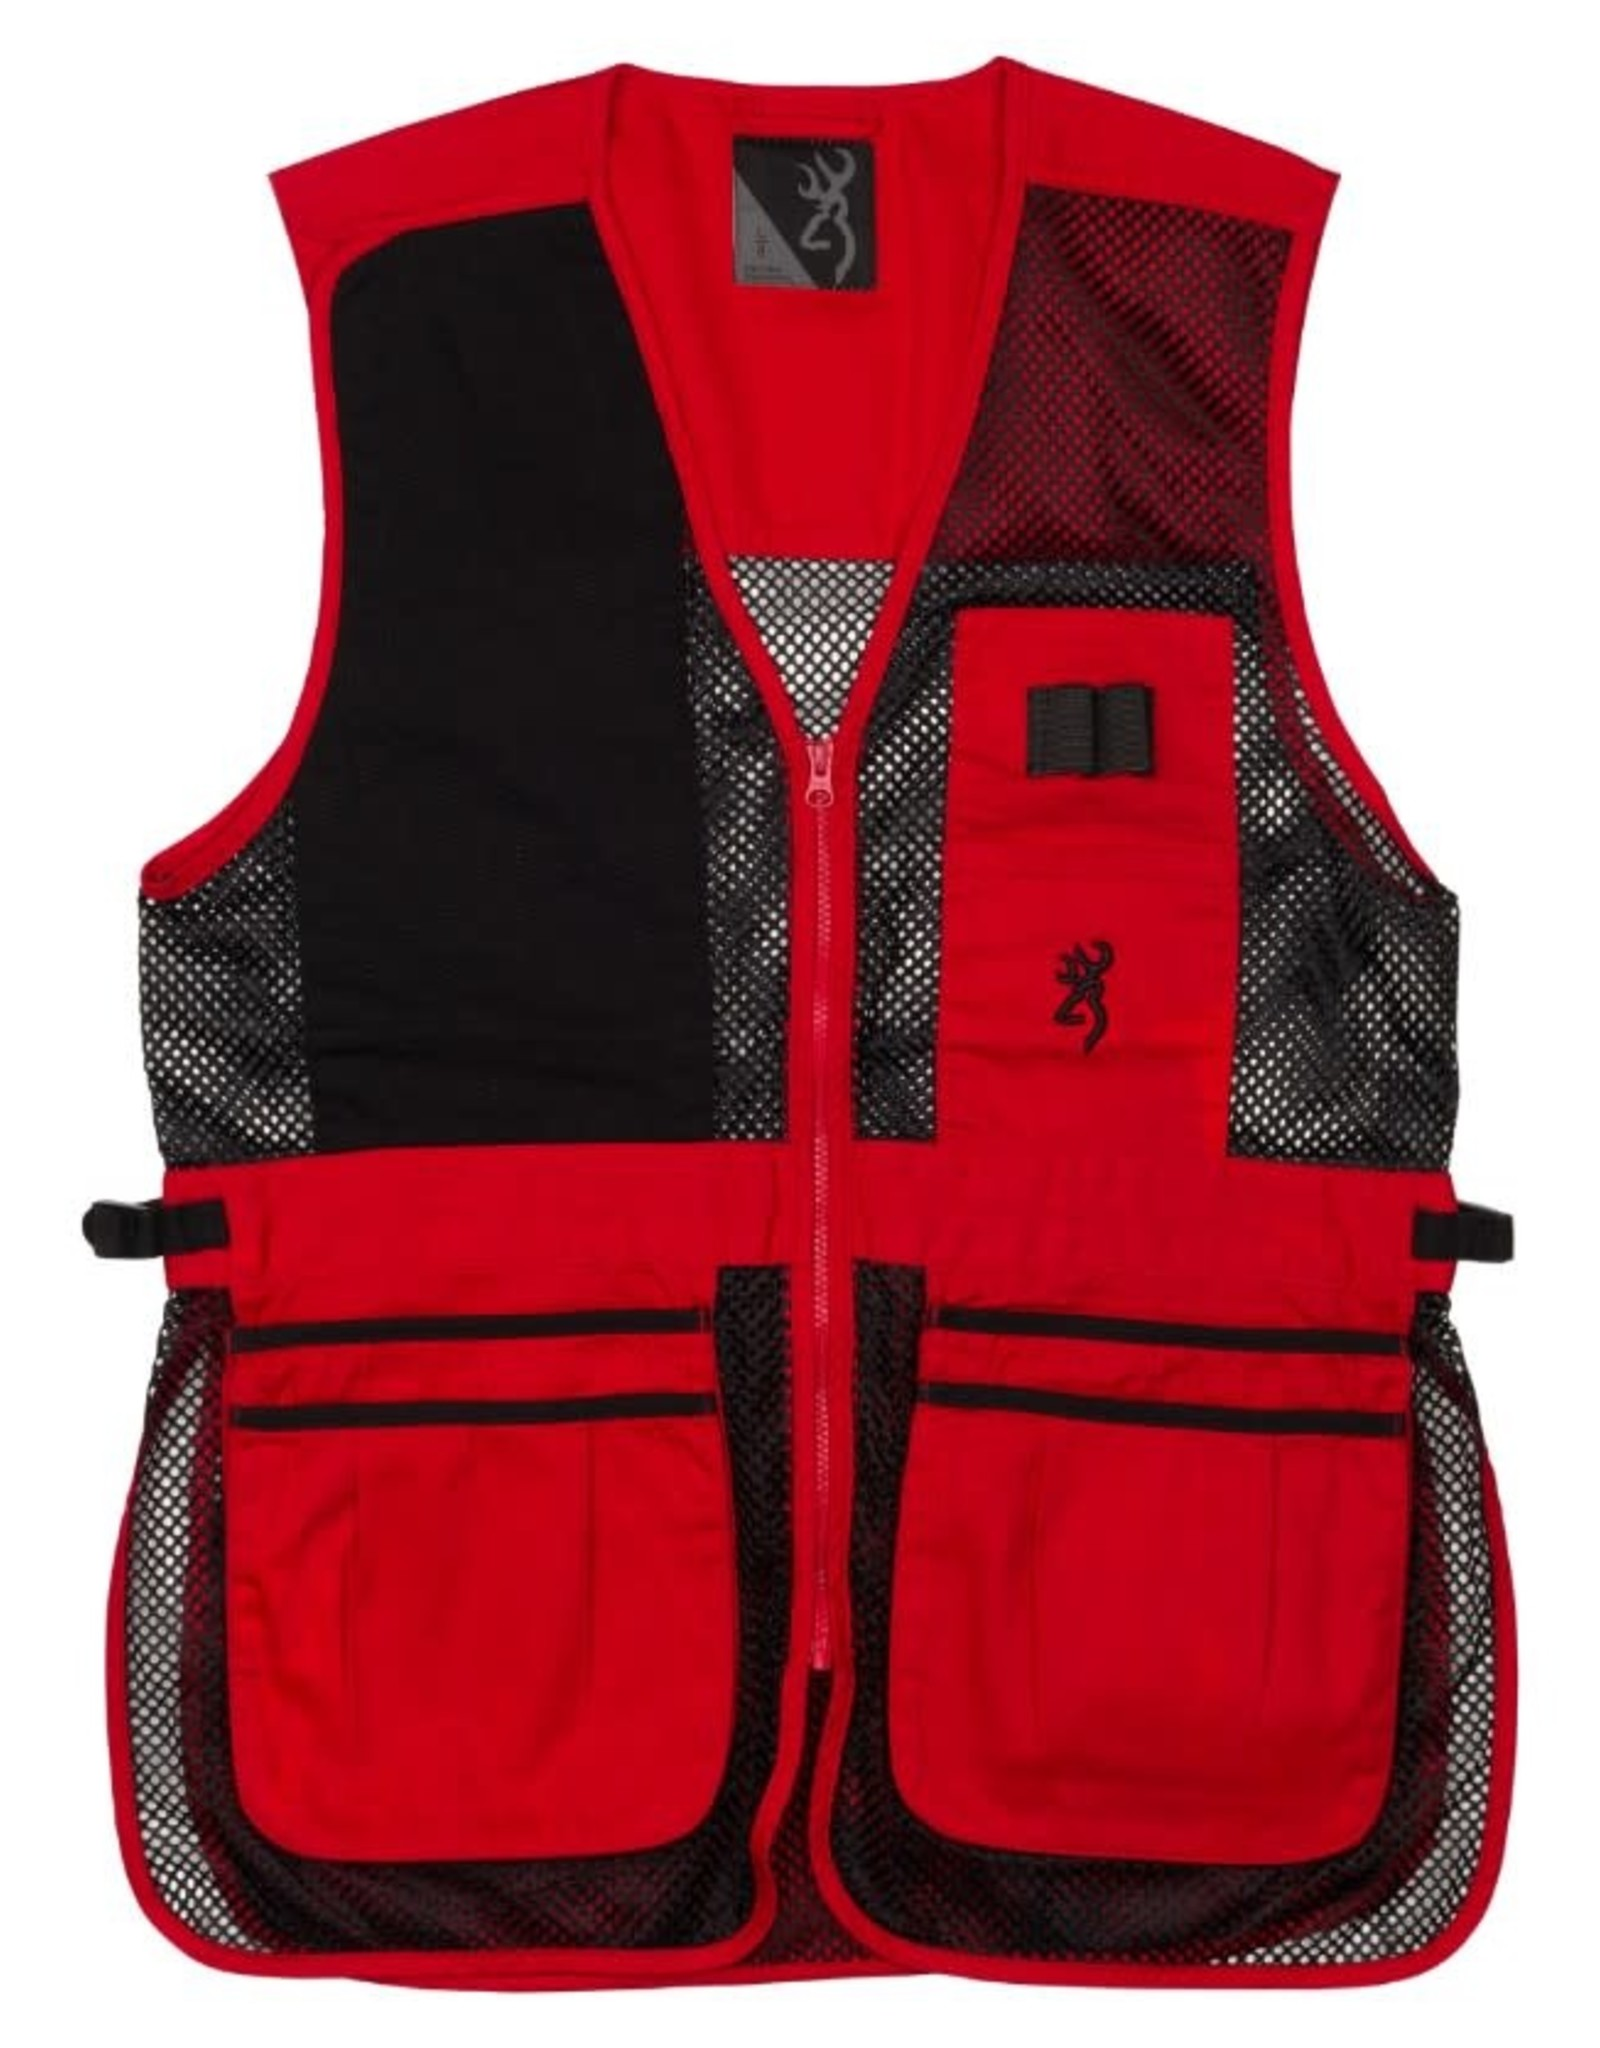 Browning Trapper Creek Vest - Red/Blk - XL